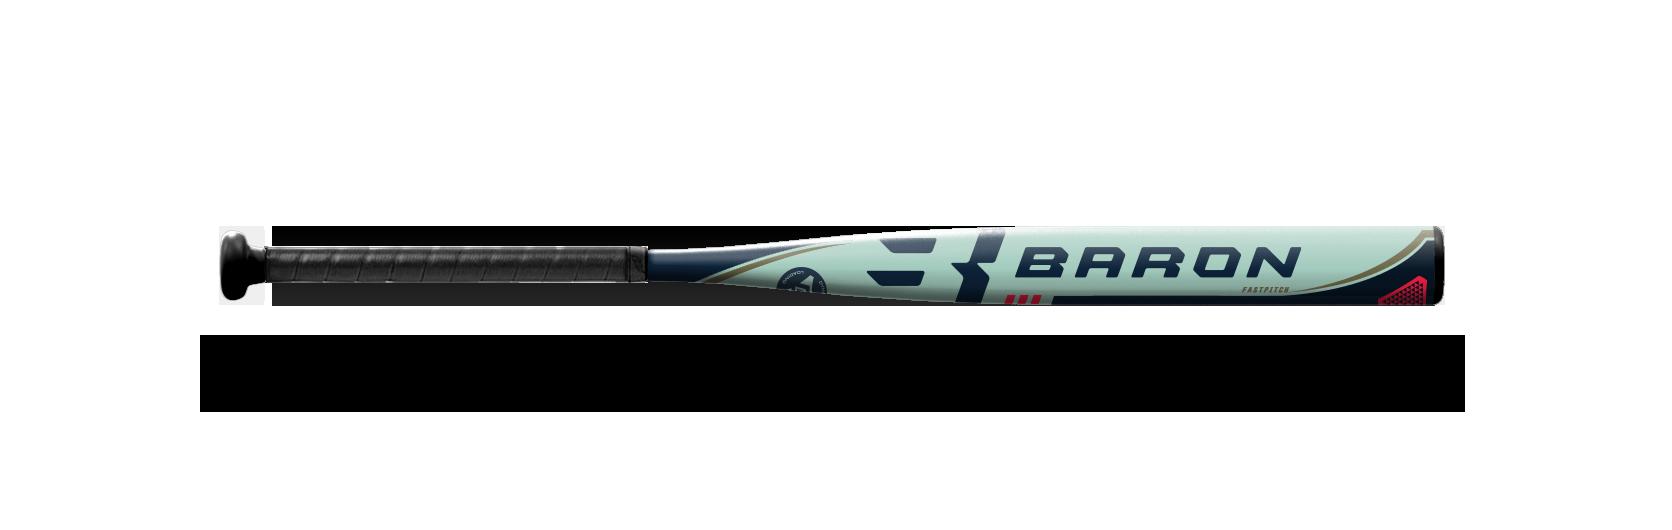 softball fastpitch bat graphics design